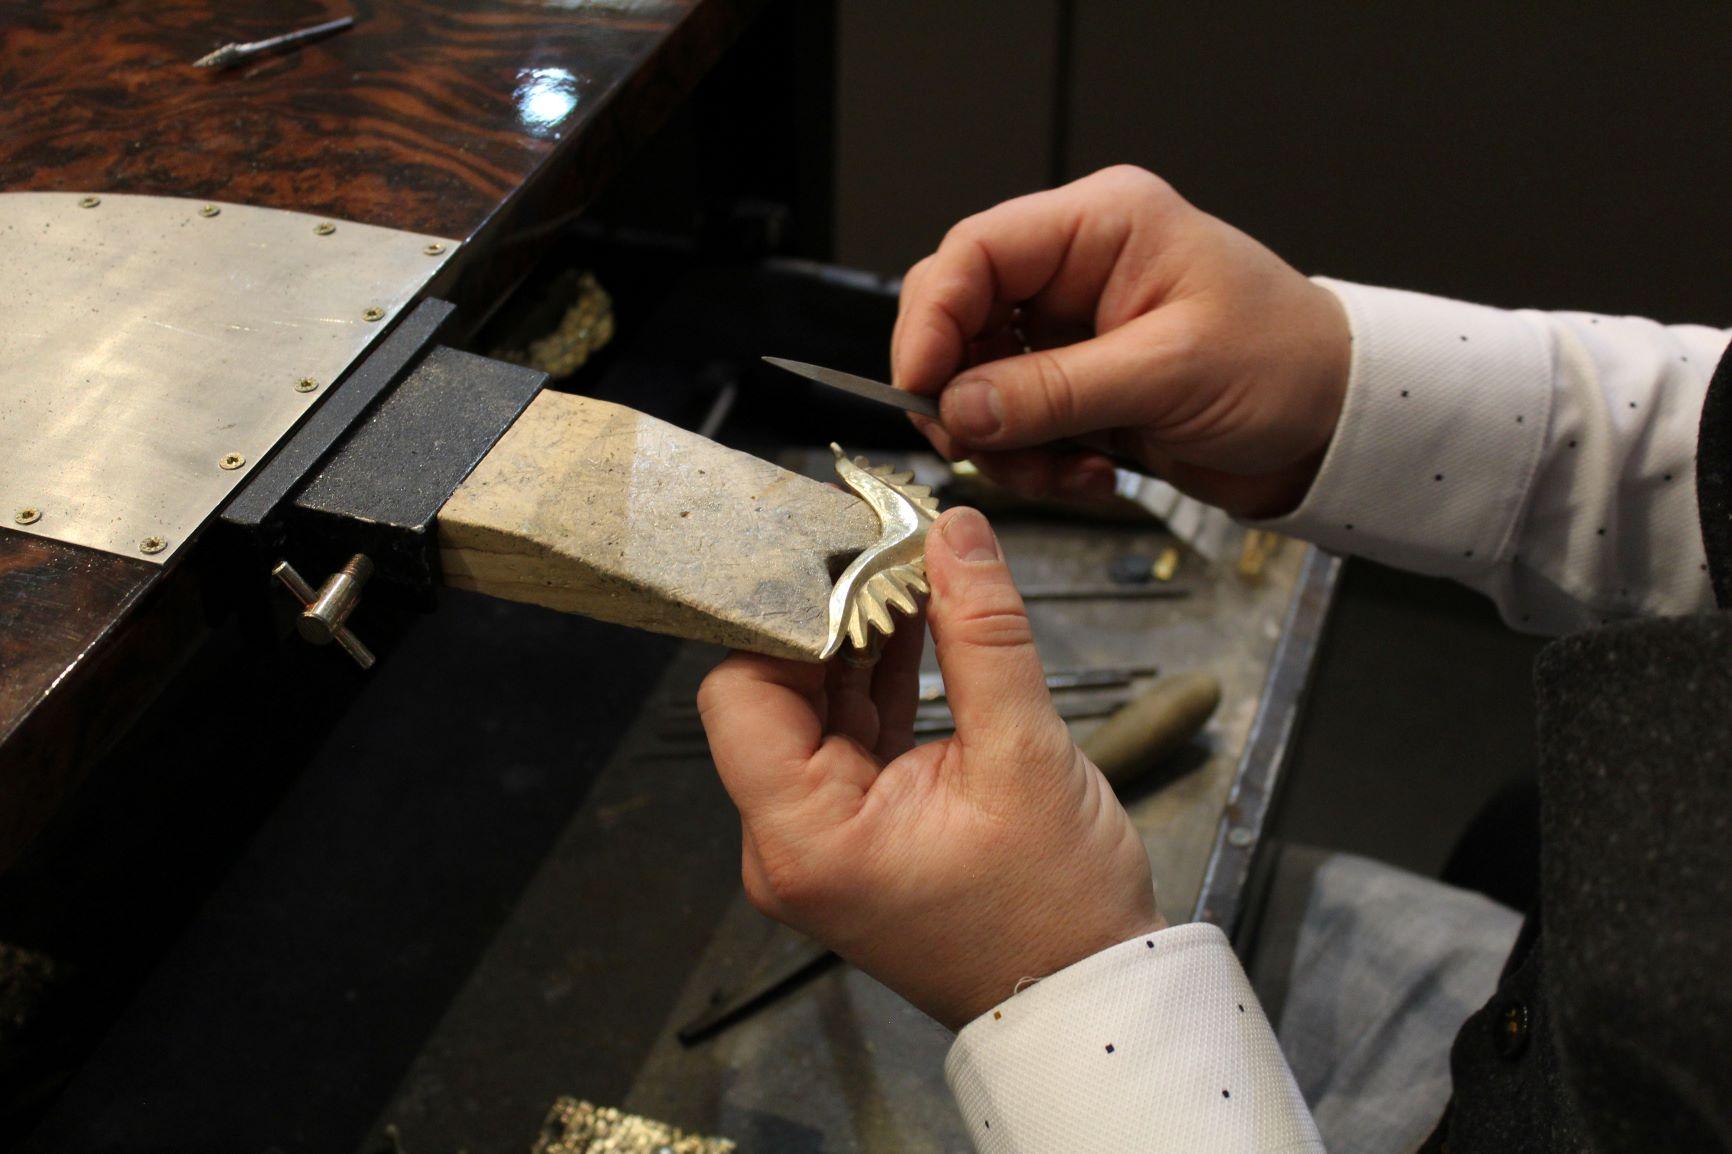 Luxury Hardware | Our Craft History maison et objet 2020 Maison et Objet 2020 | Our Craft History IMG 1758